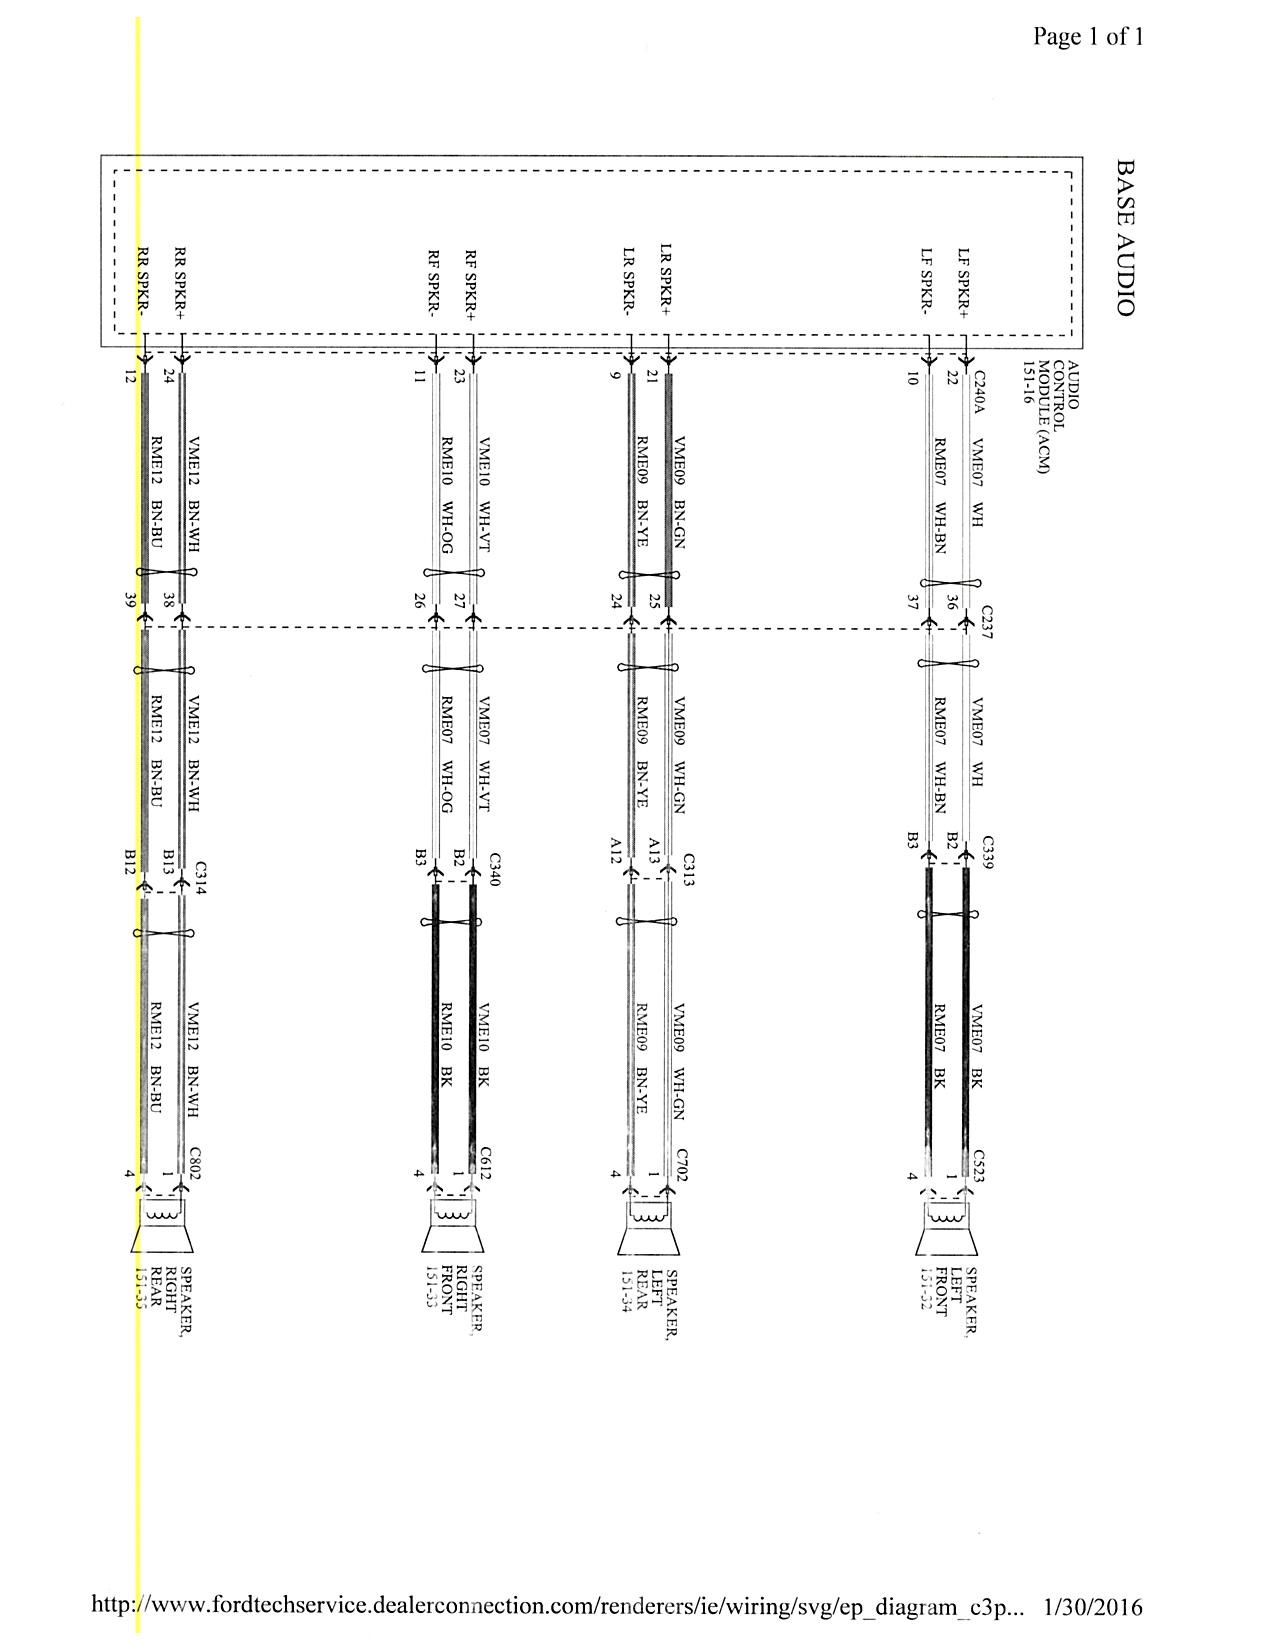 2015 focus mk3 5 stereo wiring diagram? focus fanatics forum timer switch cummins wiring diagram full dvd auto